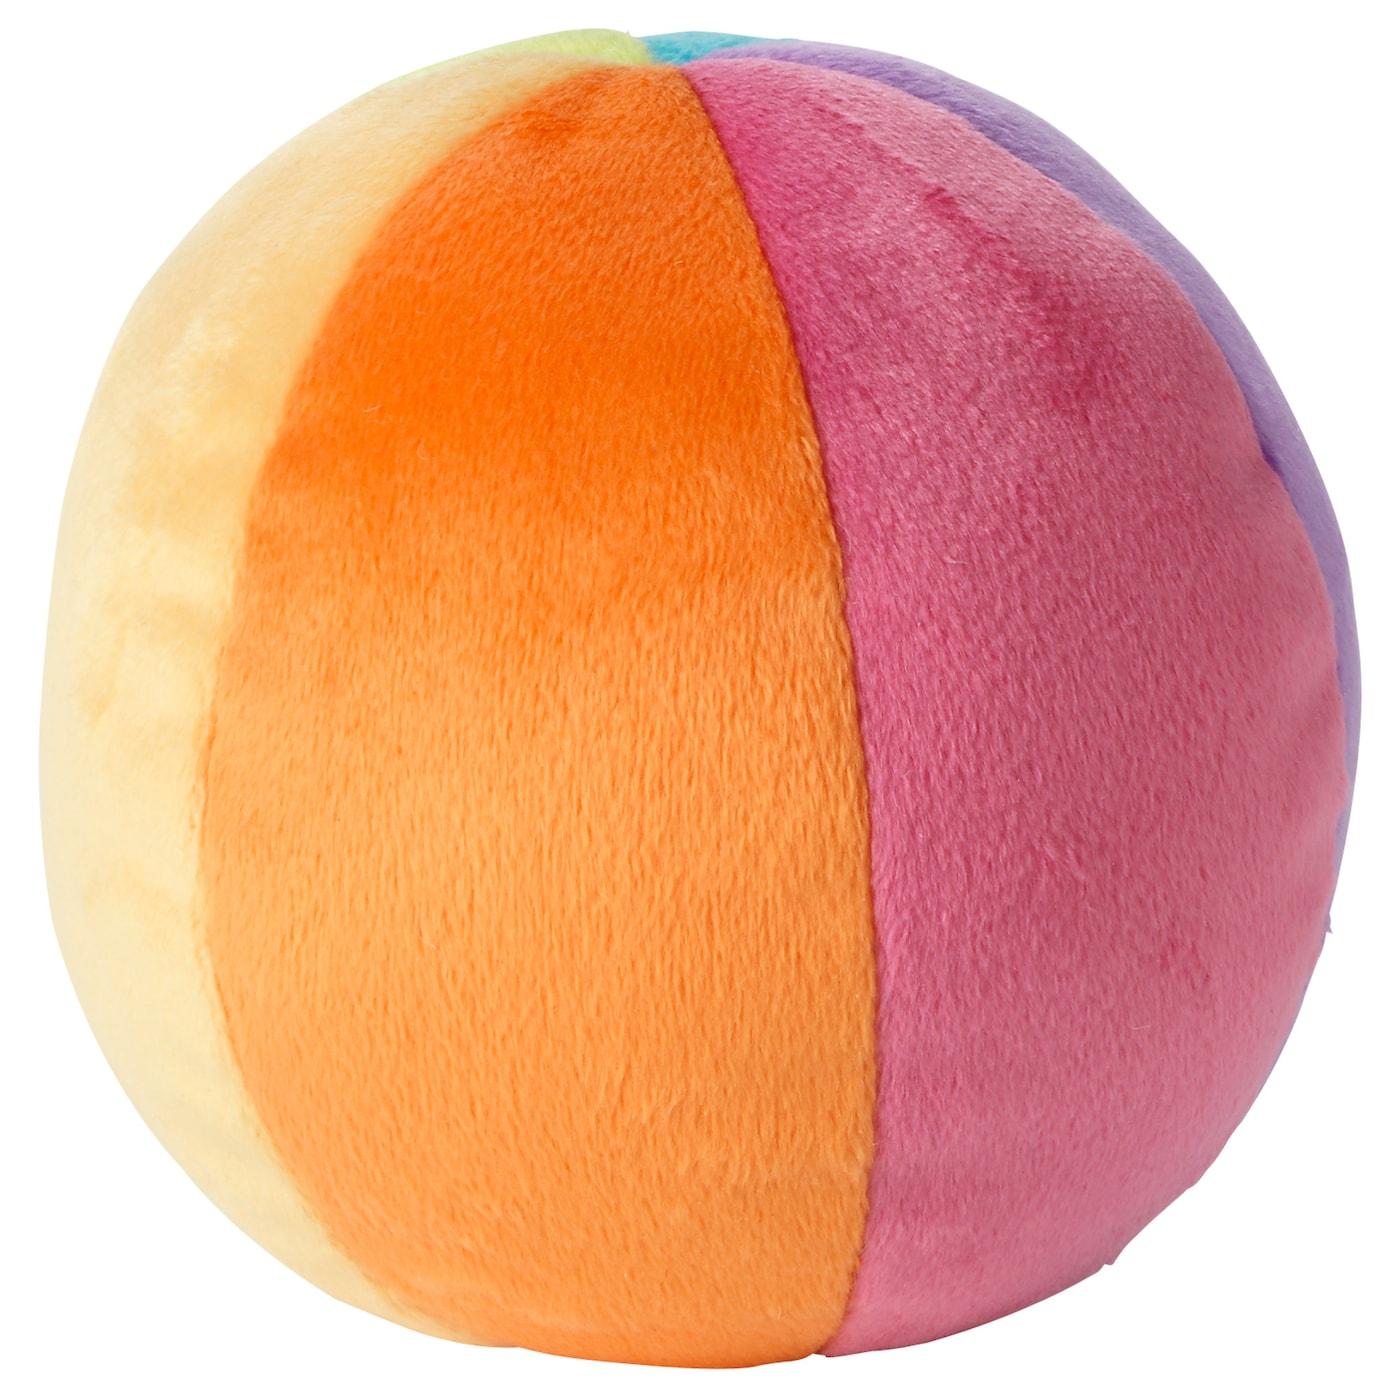 LEKA Soft toy ball Multicolour IKEA